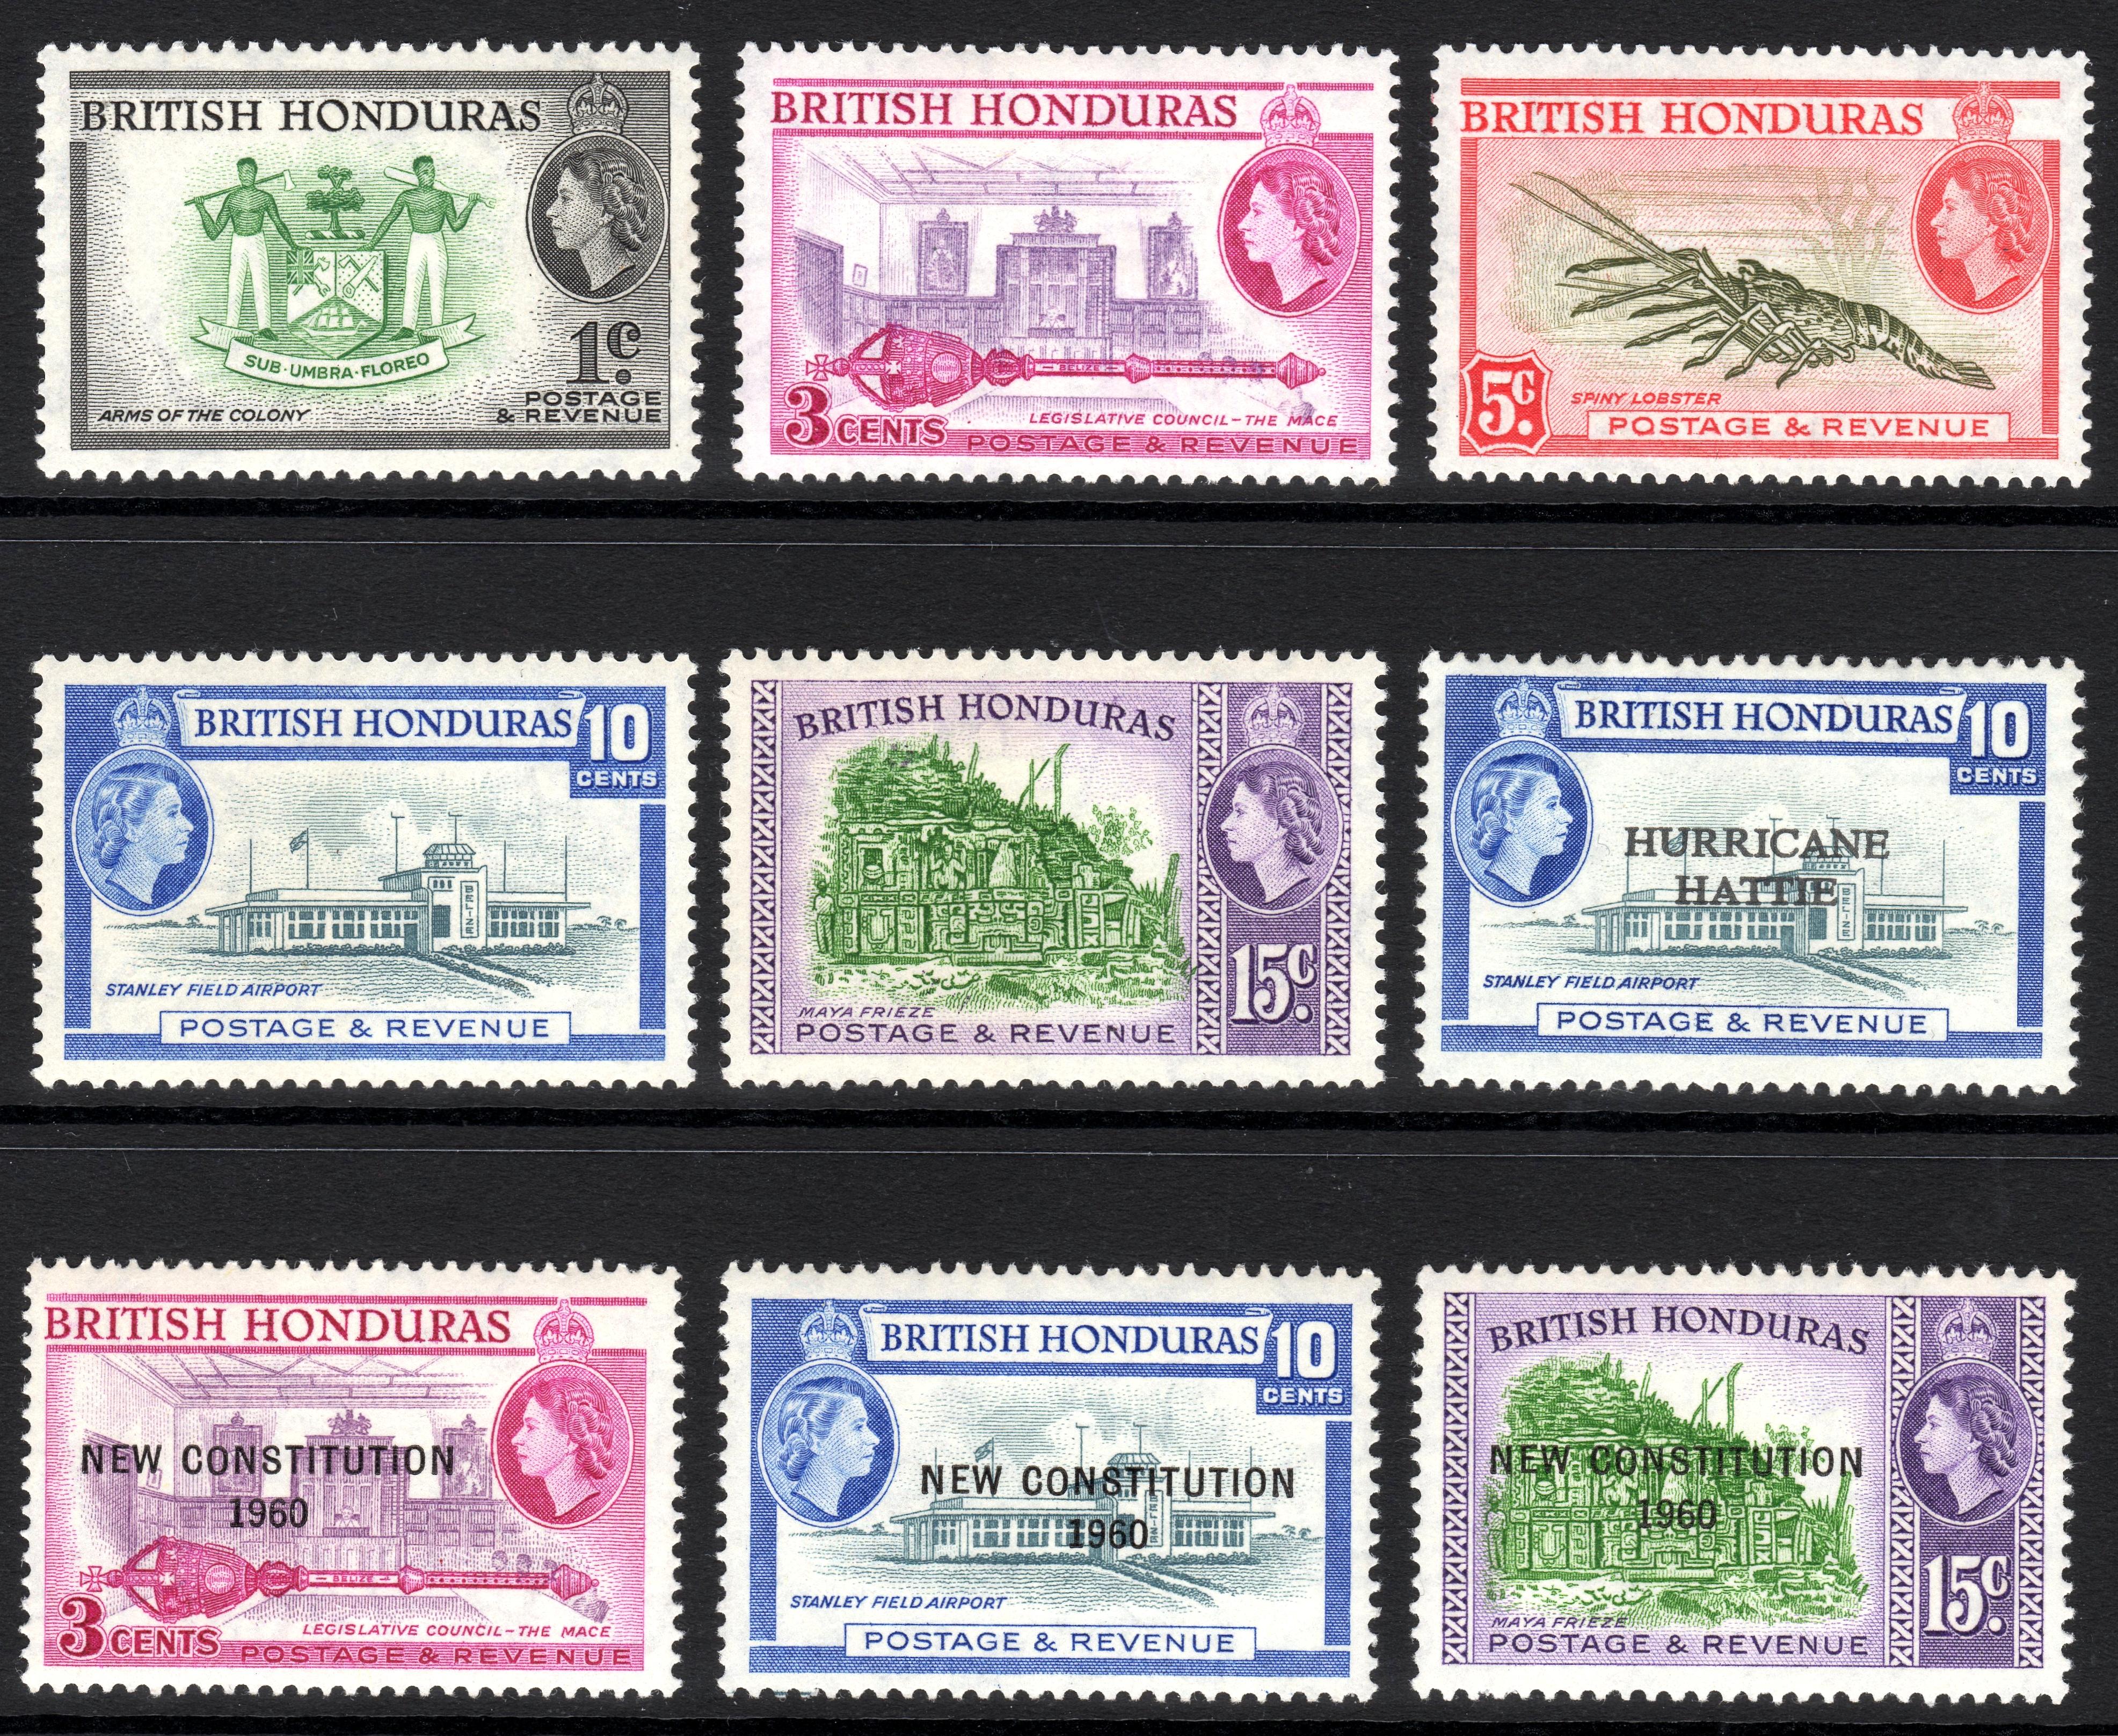 1961 British Honduras 1 Cent